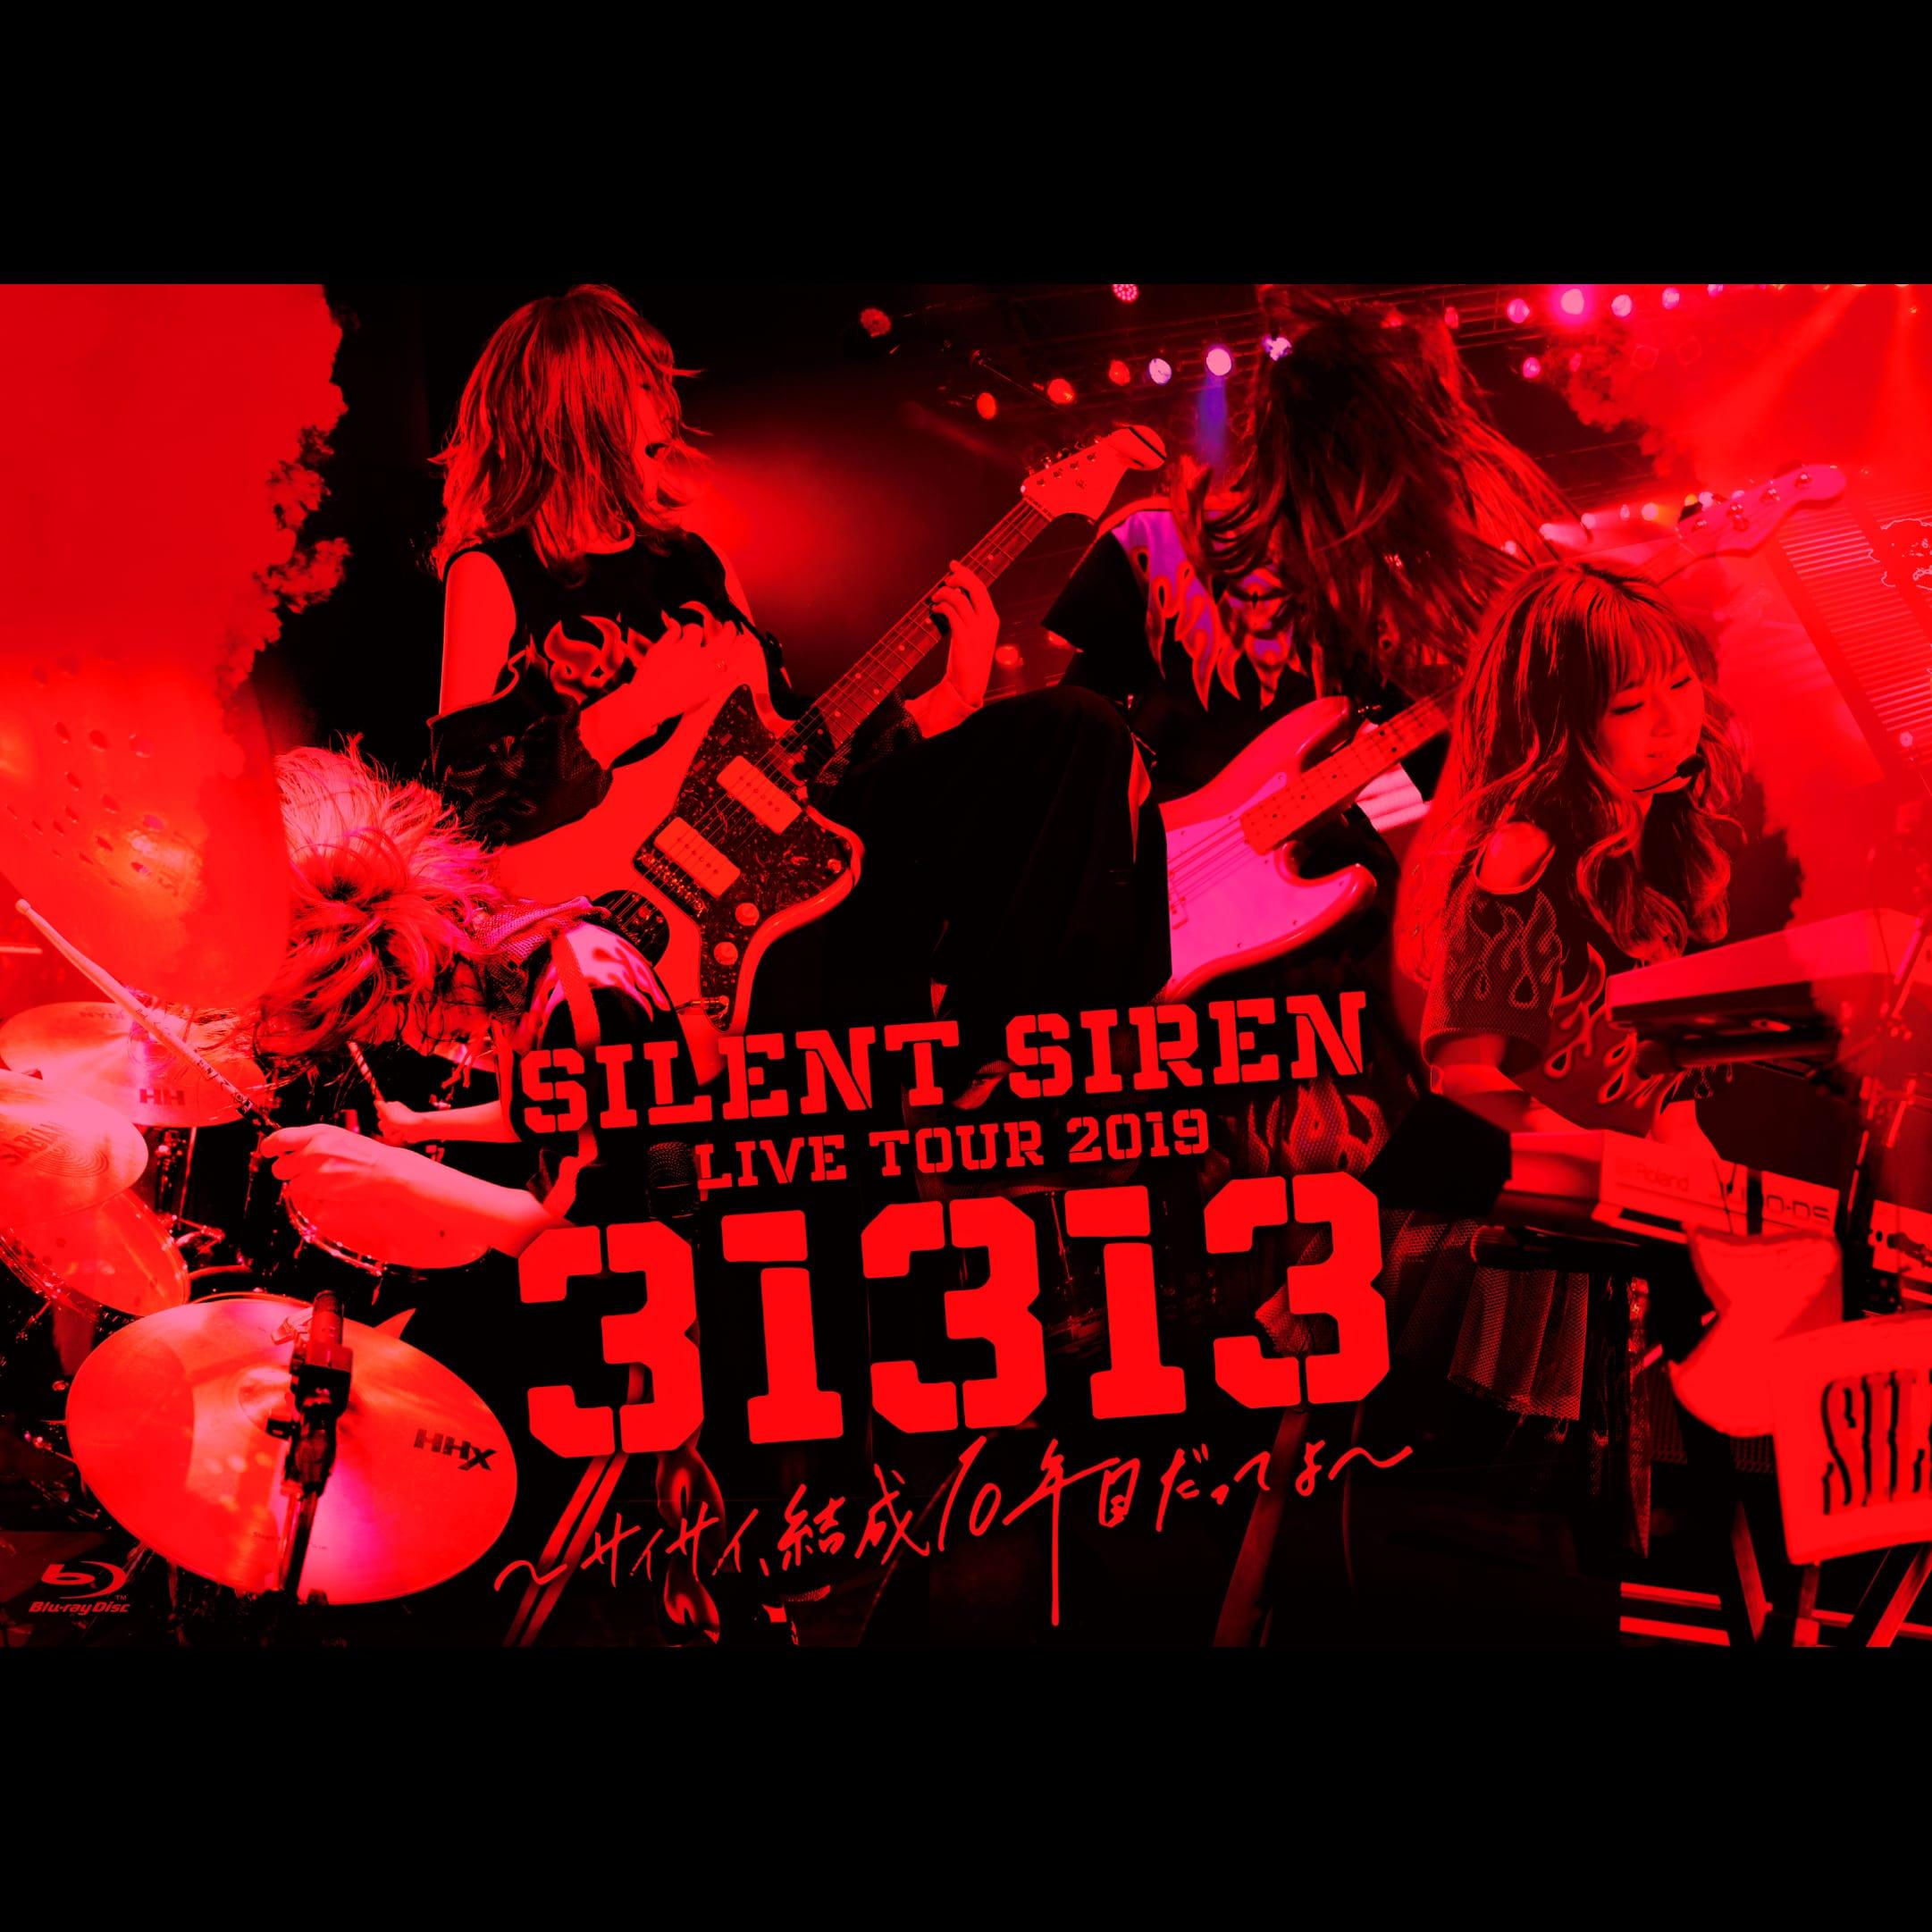 SILENT SIREN LIVE TOUR 2019『31313』